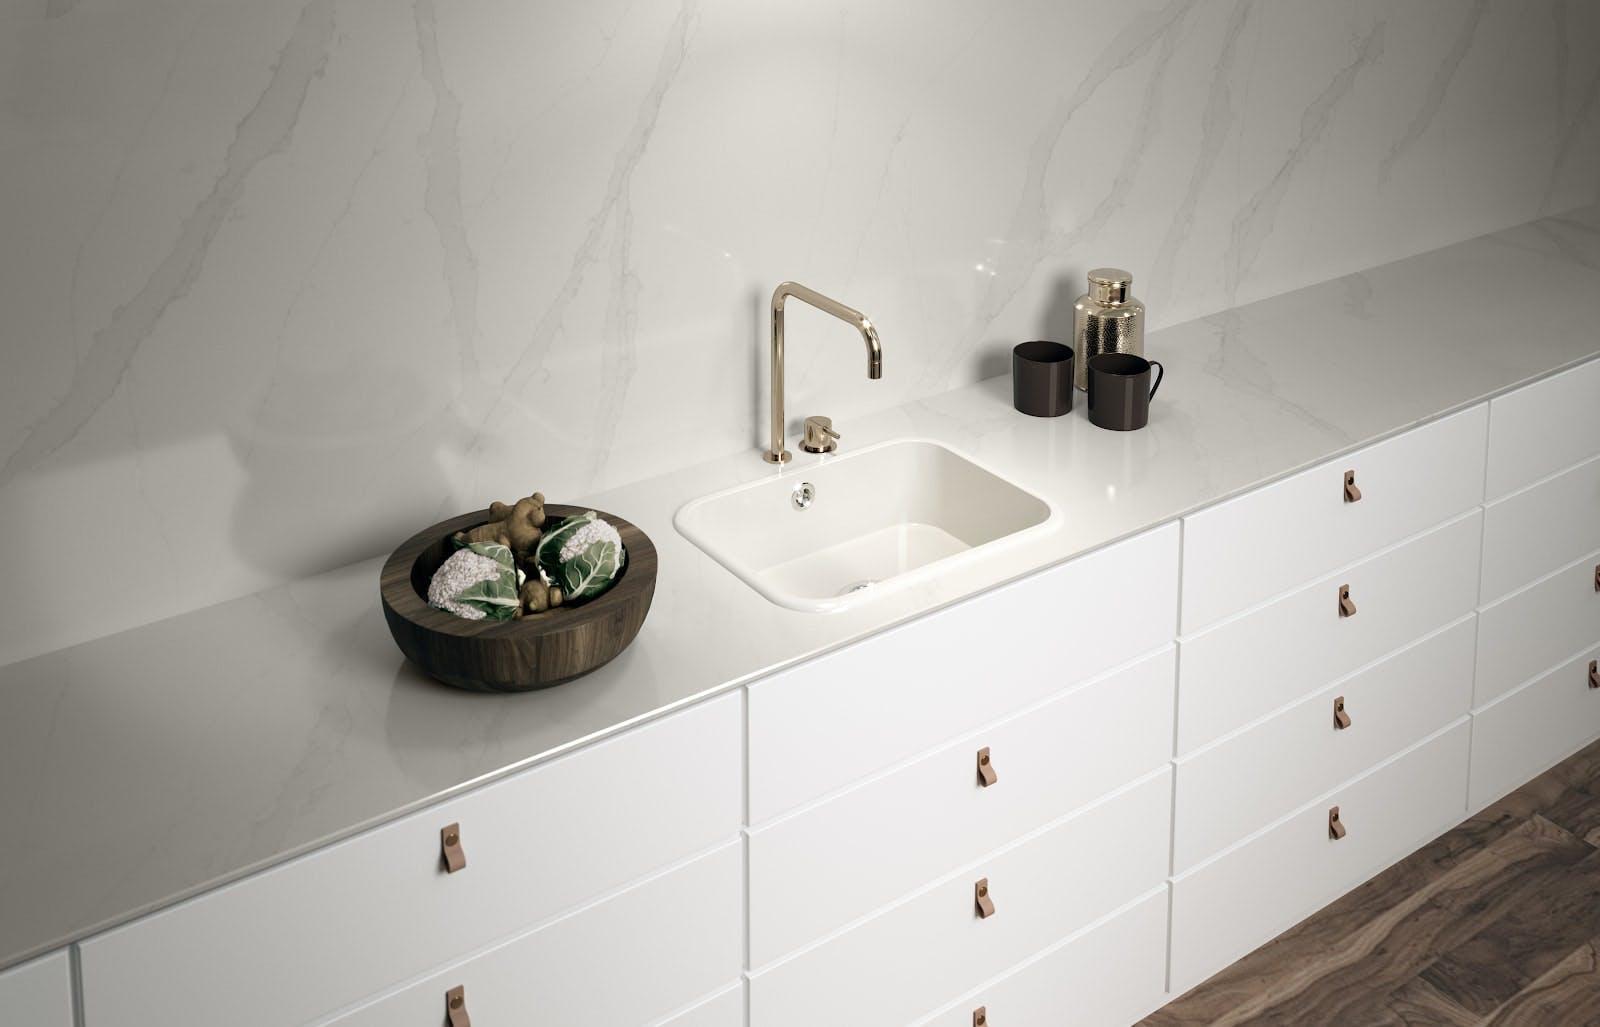 White Quartz Countertop, Quartz Countertops Bathroom